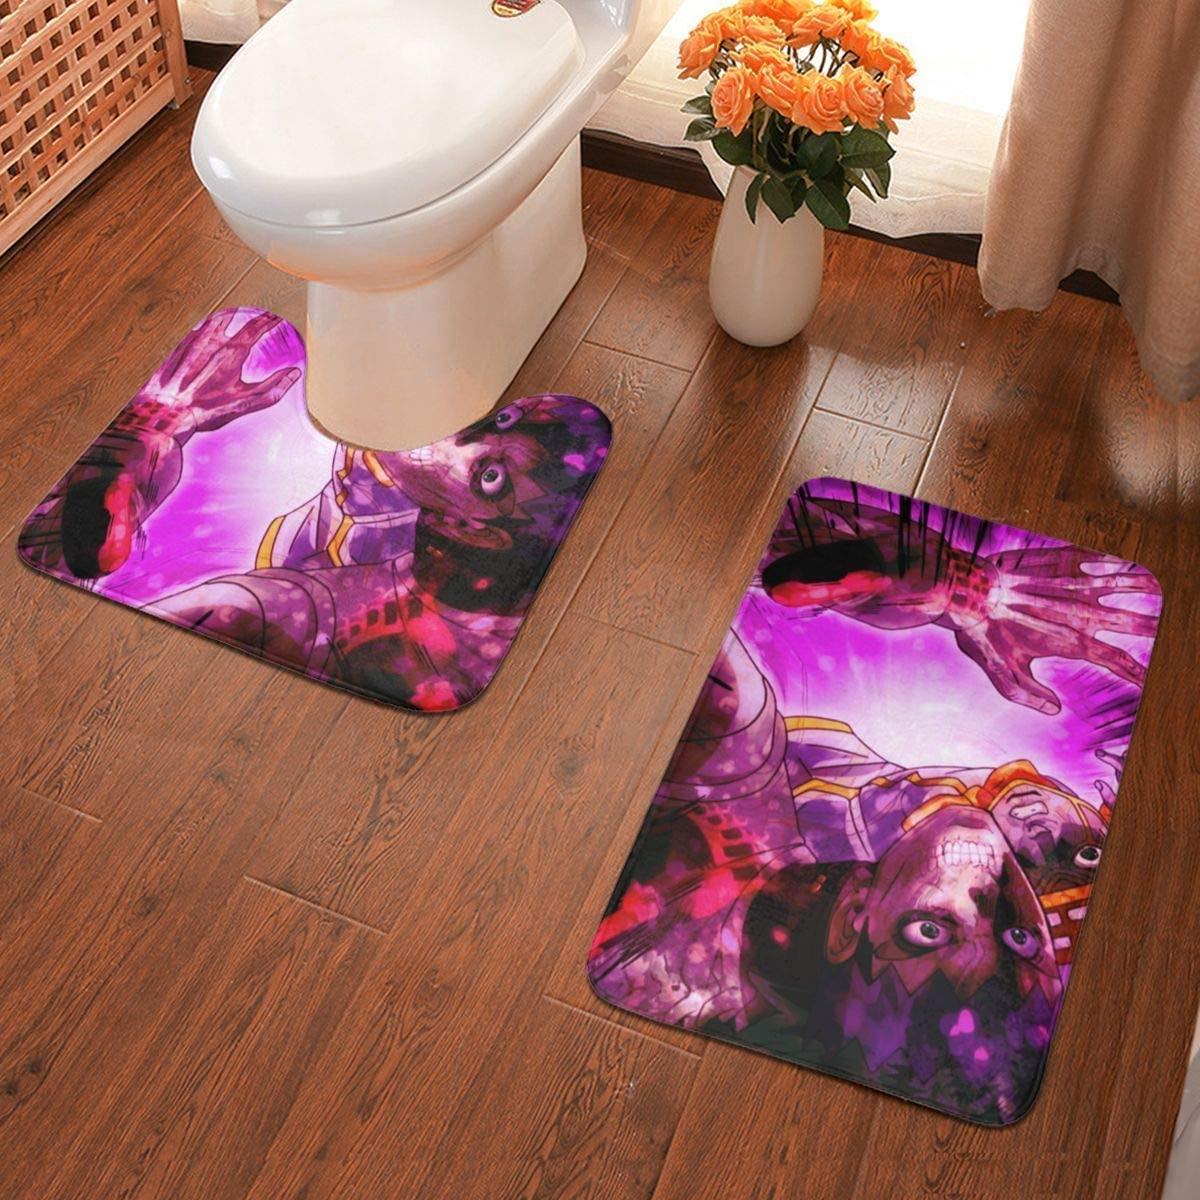 Boweike JoJo's Bizarre Adventure Bathroom Antiskid Pad Non-Slip Bath Carpet Floor Mat Rug 2 Sets -Floor Mat+U-Shaped Pad, Toilet Washable Blanket Mats for Bathroom Home Shower